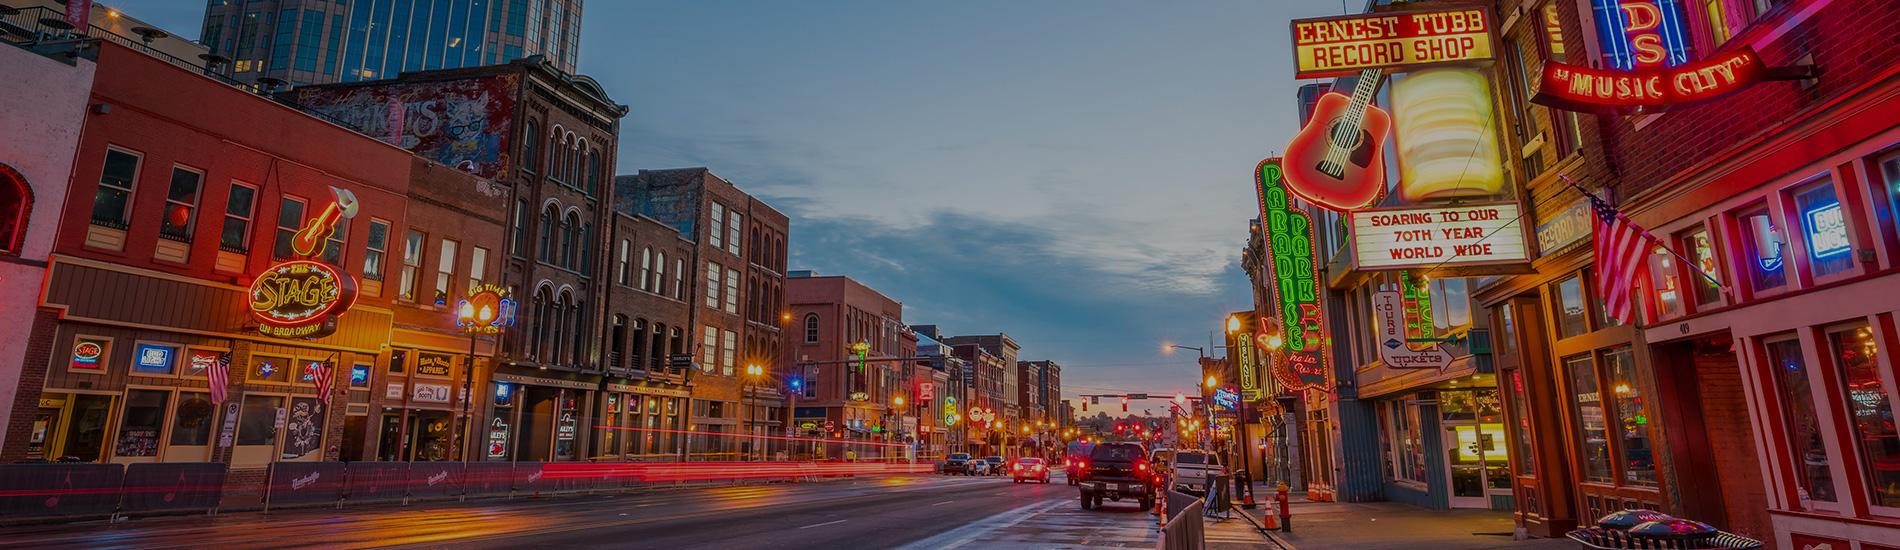 Nashville, Tennessee at dusk